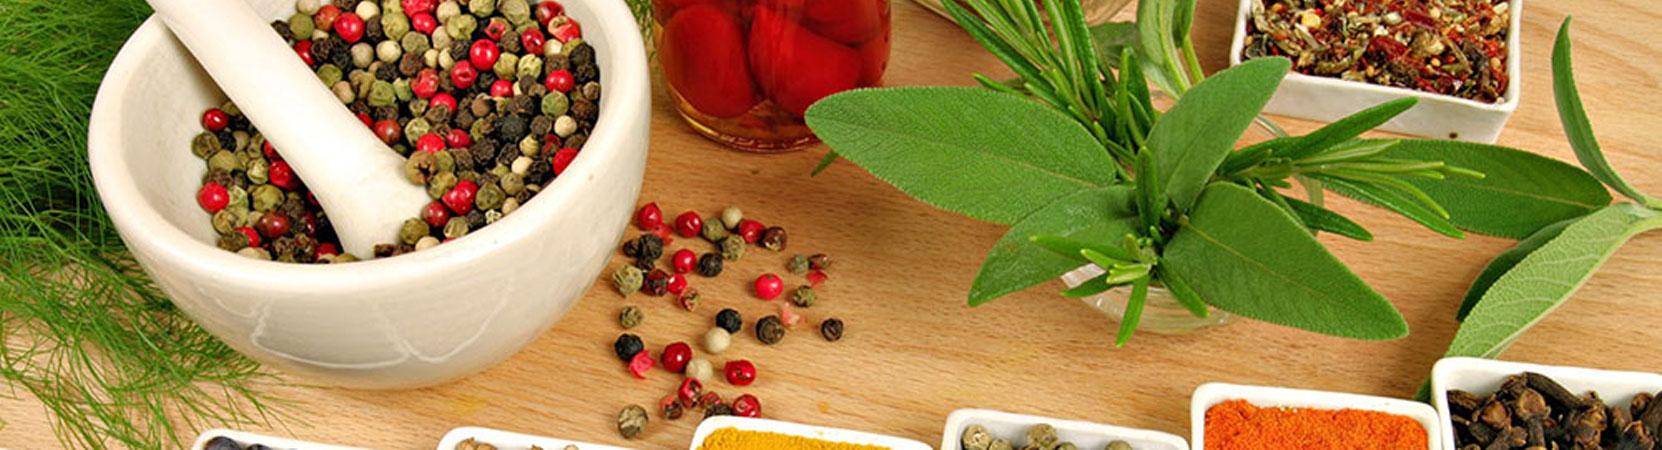 herbsnherbalextracts com | Essential Oils